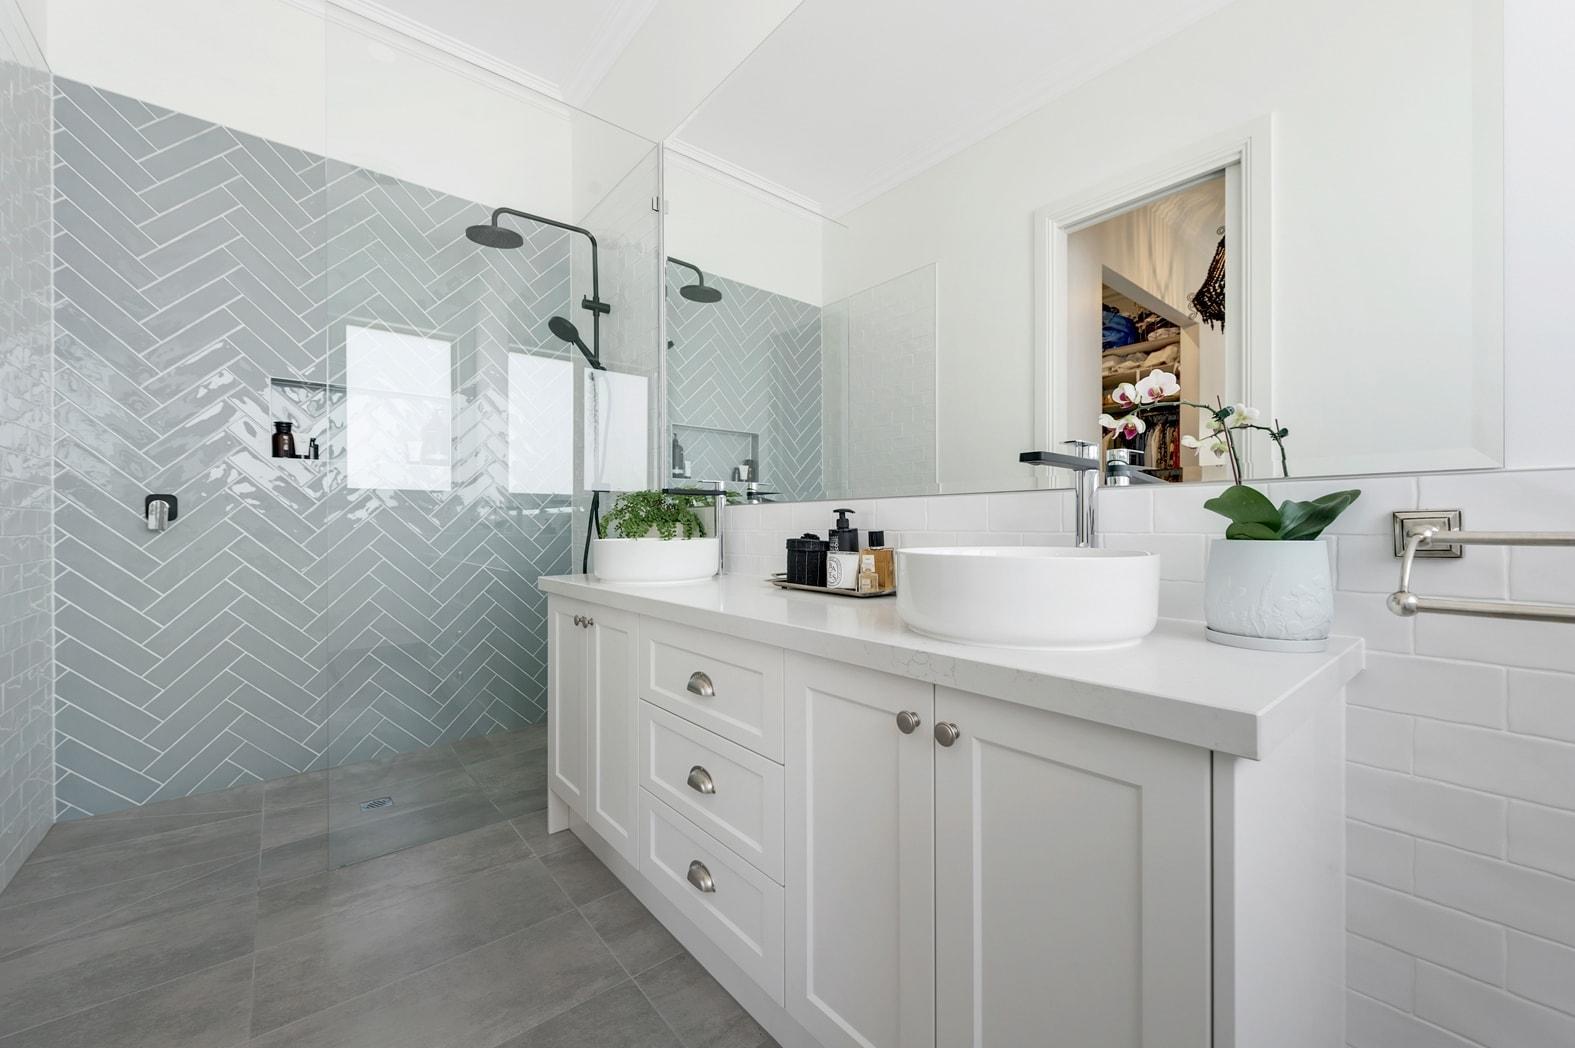 hamptons bathroom with white shaker vanity and blue herringbone tile on shower wall black tapware